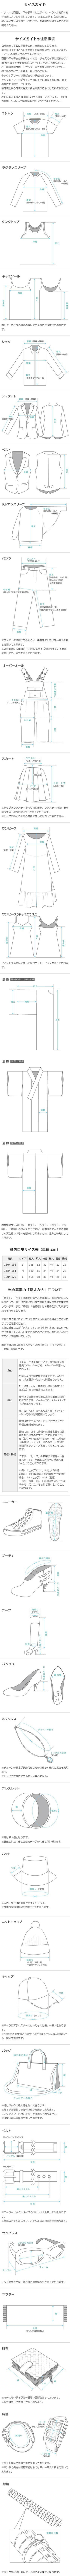 size_guide.jpg